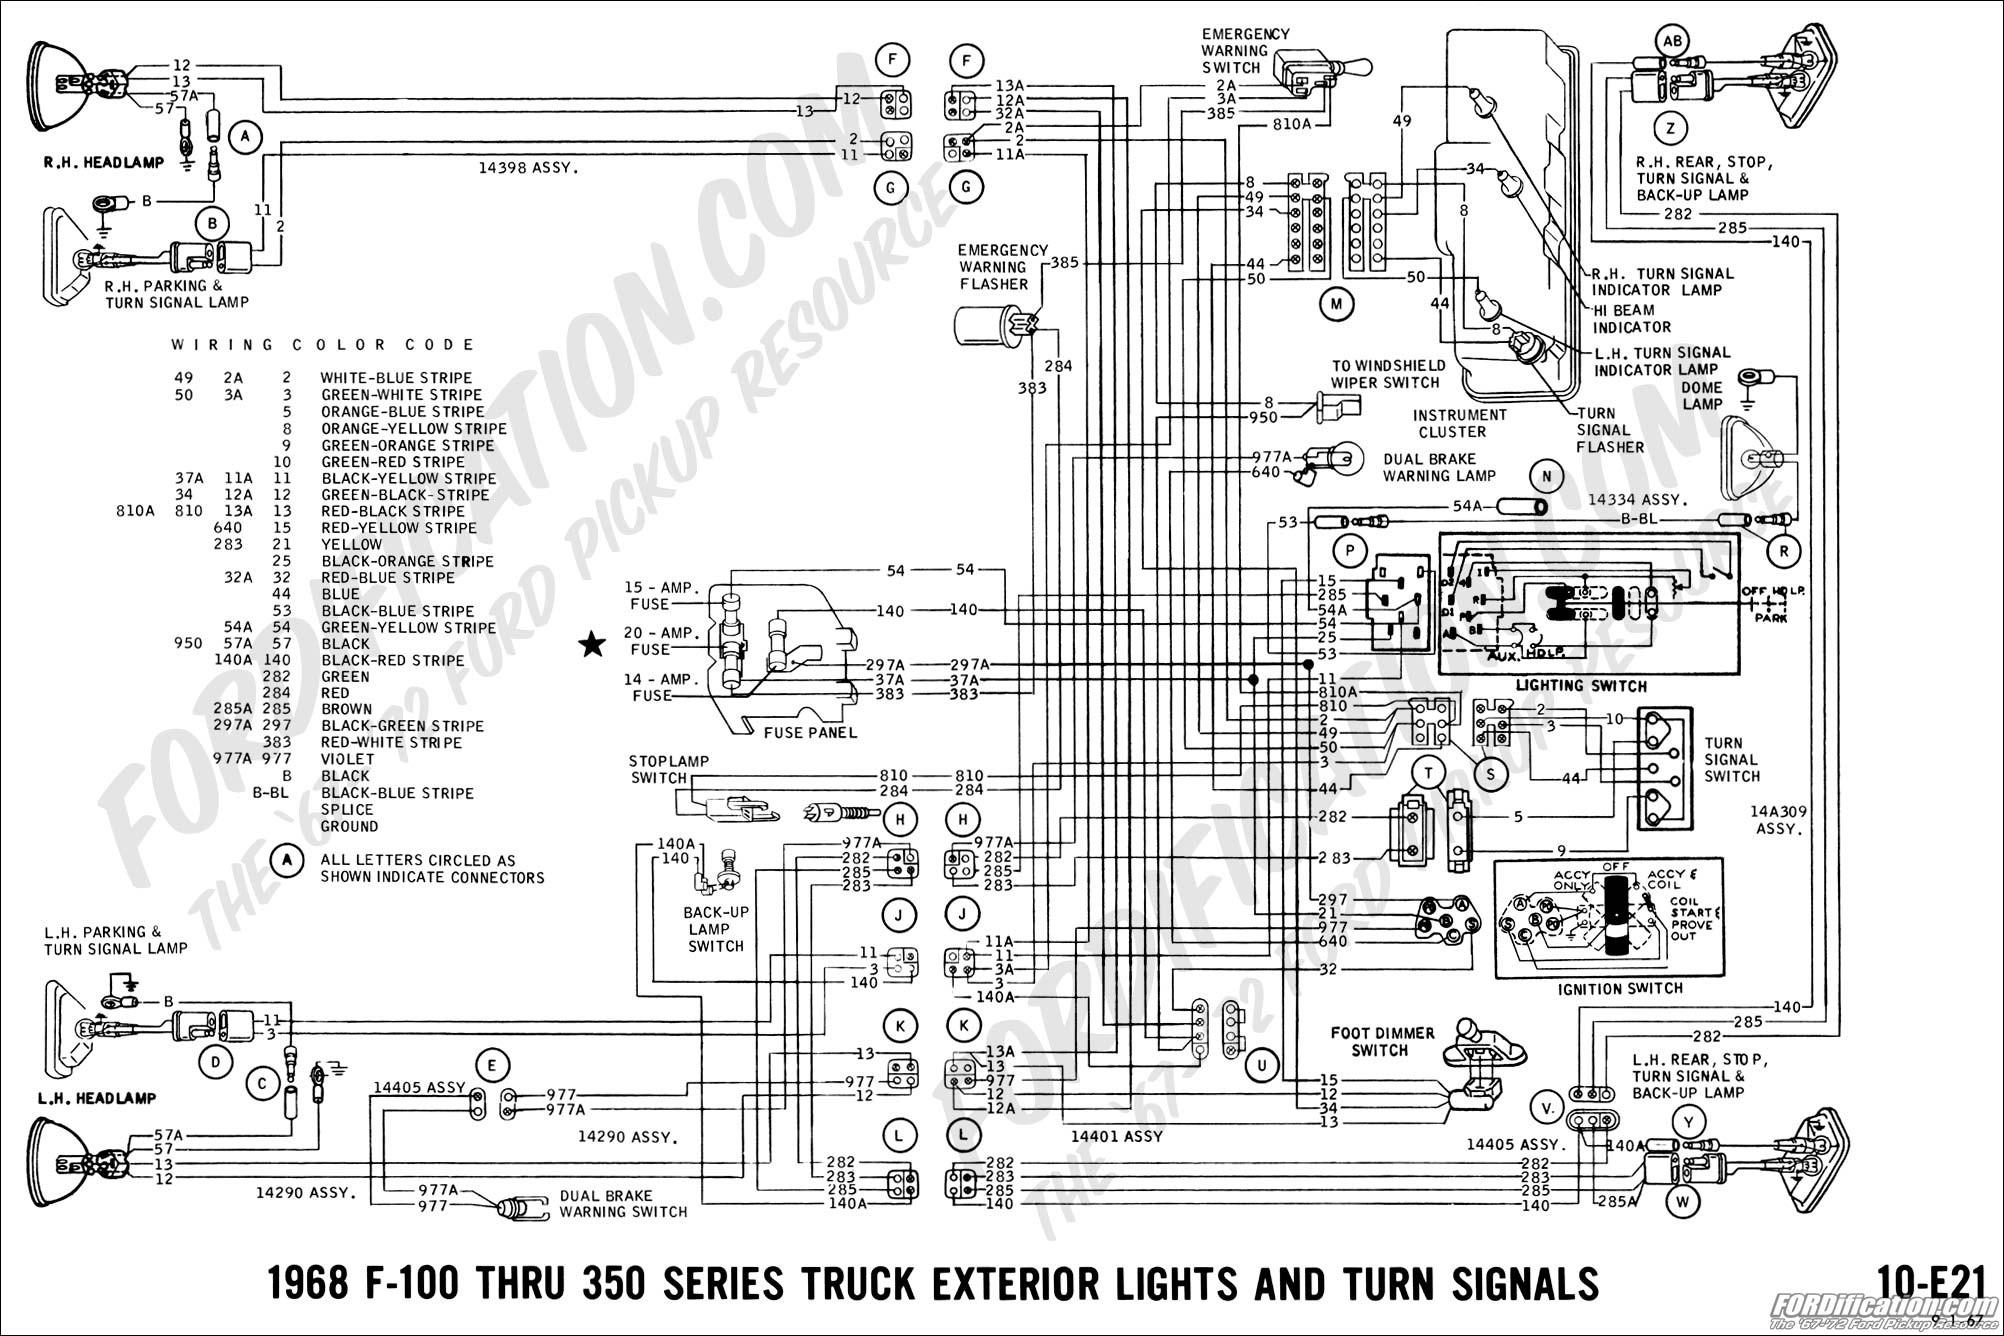 2008 F350 Tail Light Wiring Diagram 688 ford F 350 Tail Light Wiring Diagram Of 2008 F350 Tail Light Wiring Diagram